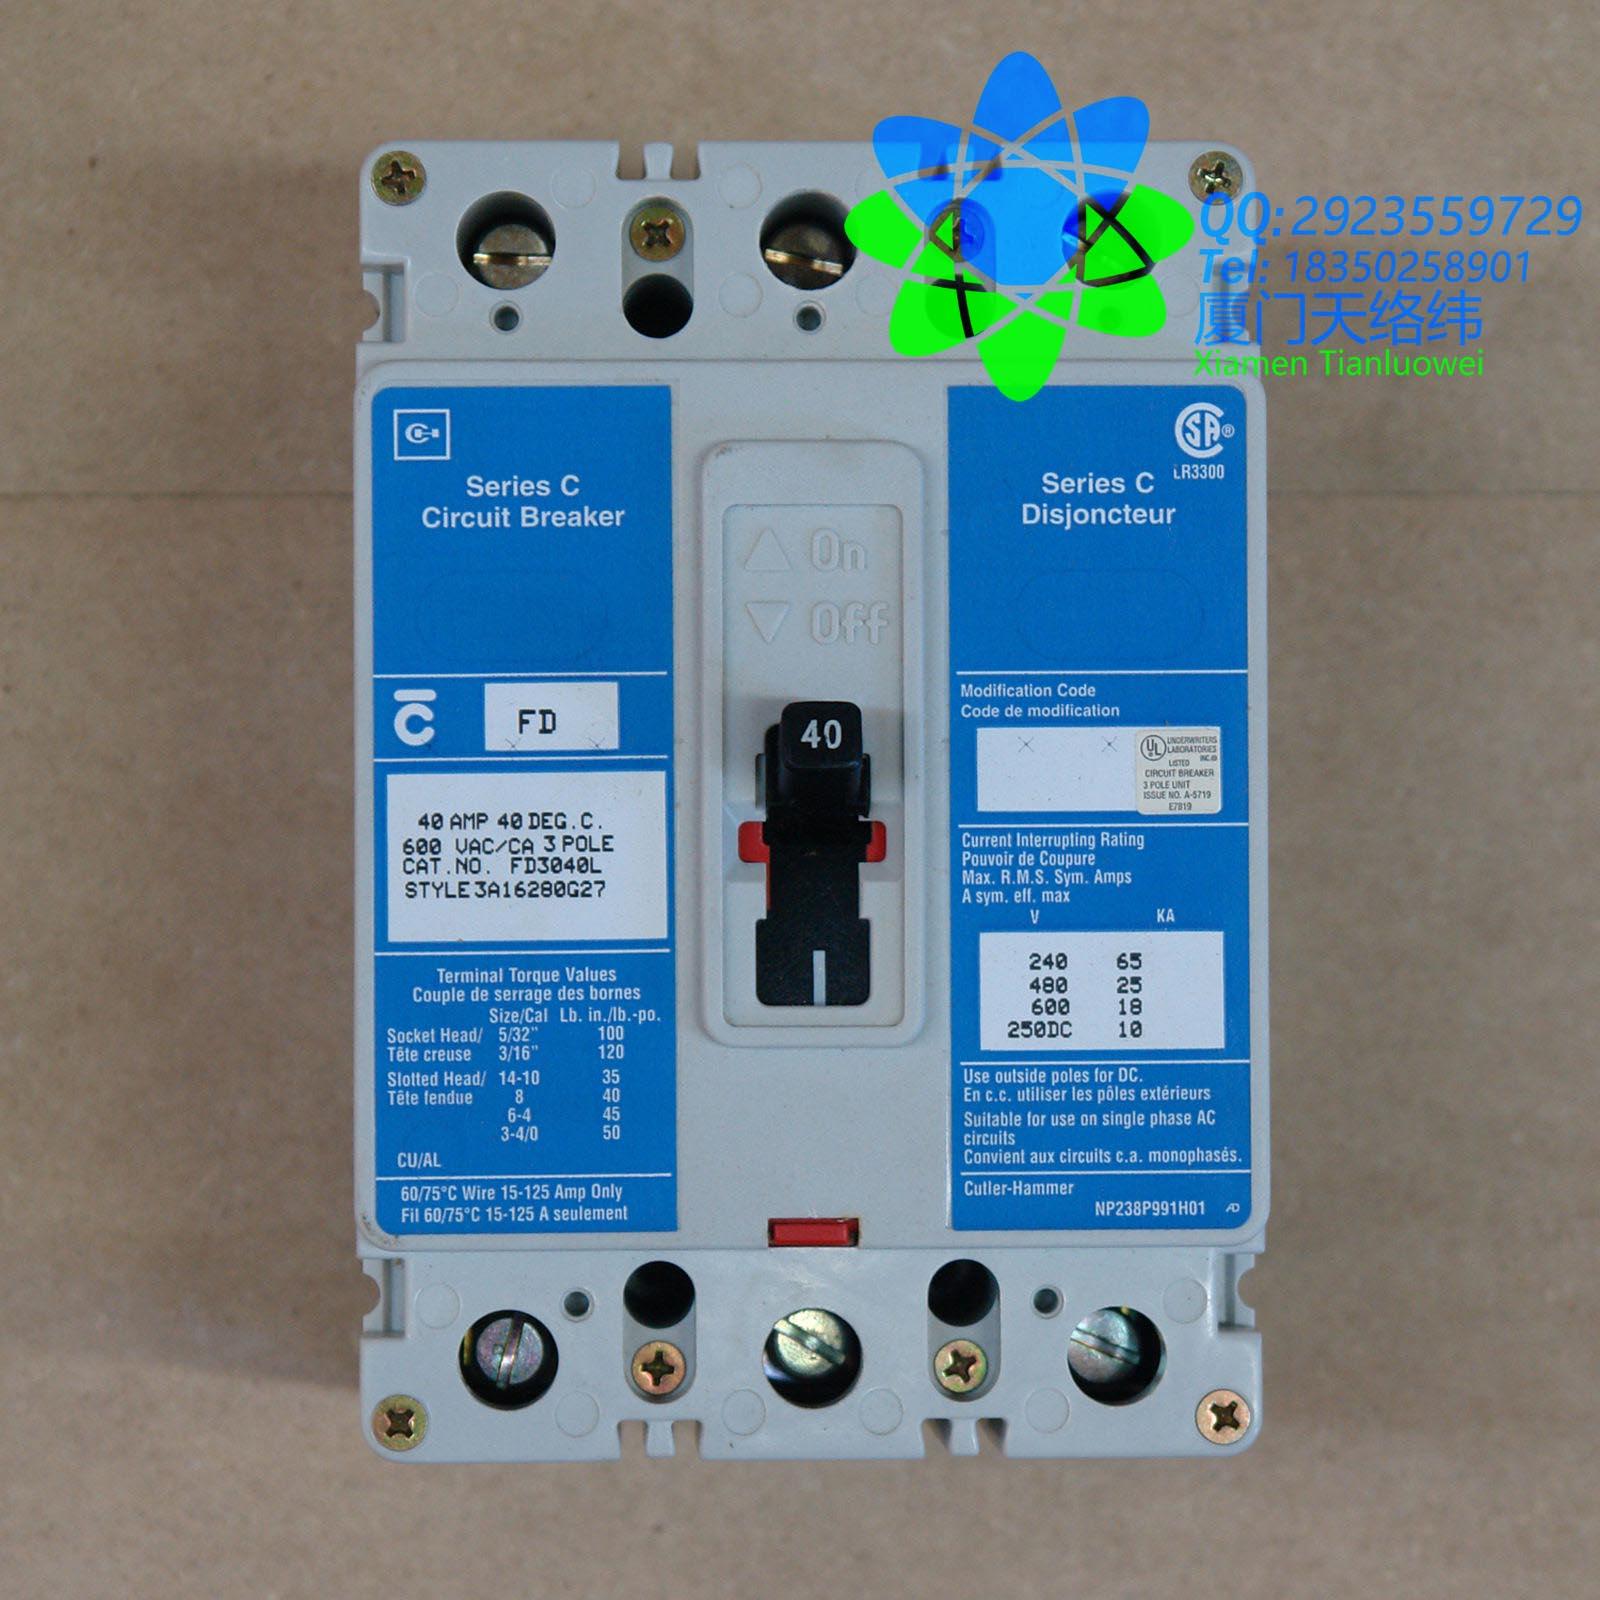 500rb10104b Proc Scully Groundhog System Wiring Diagram